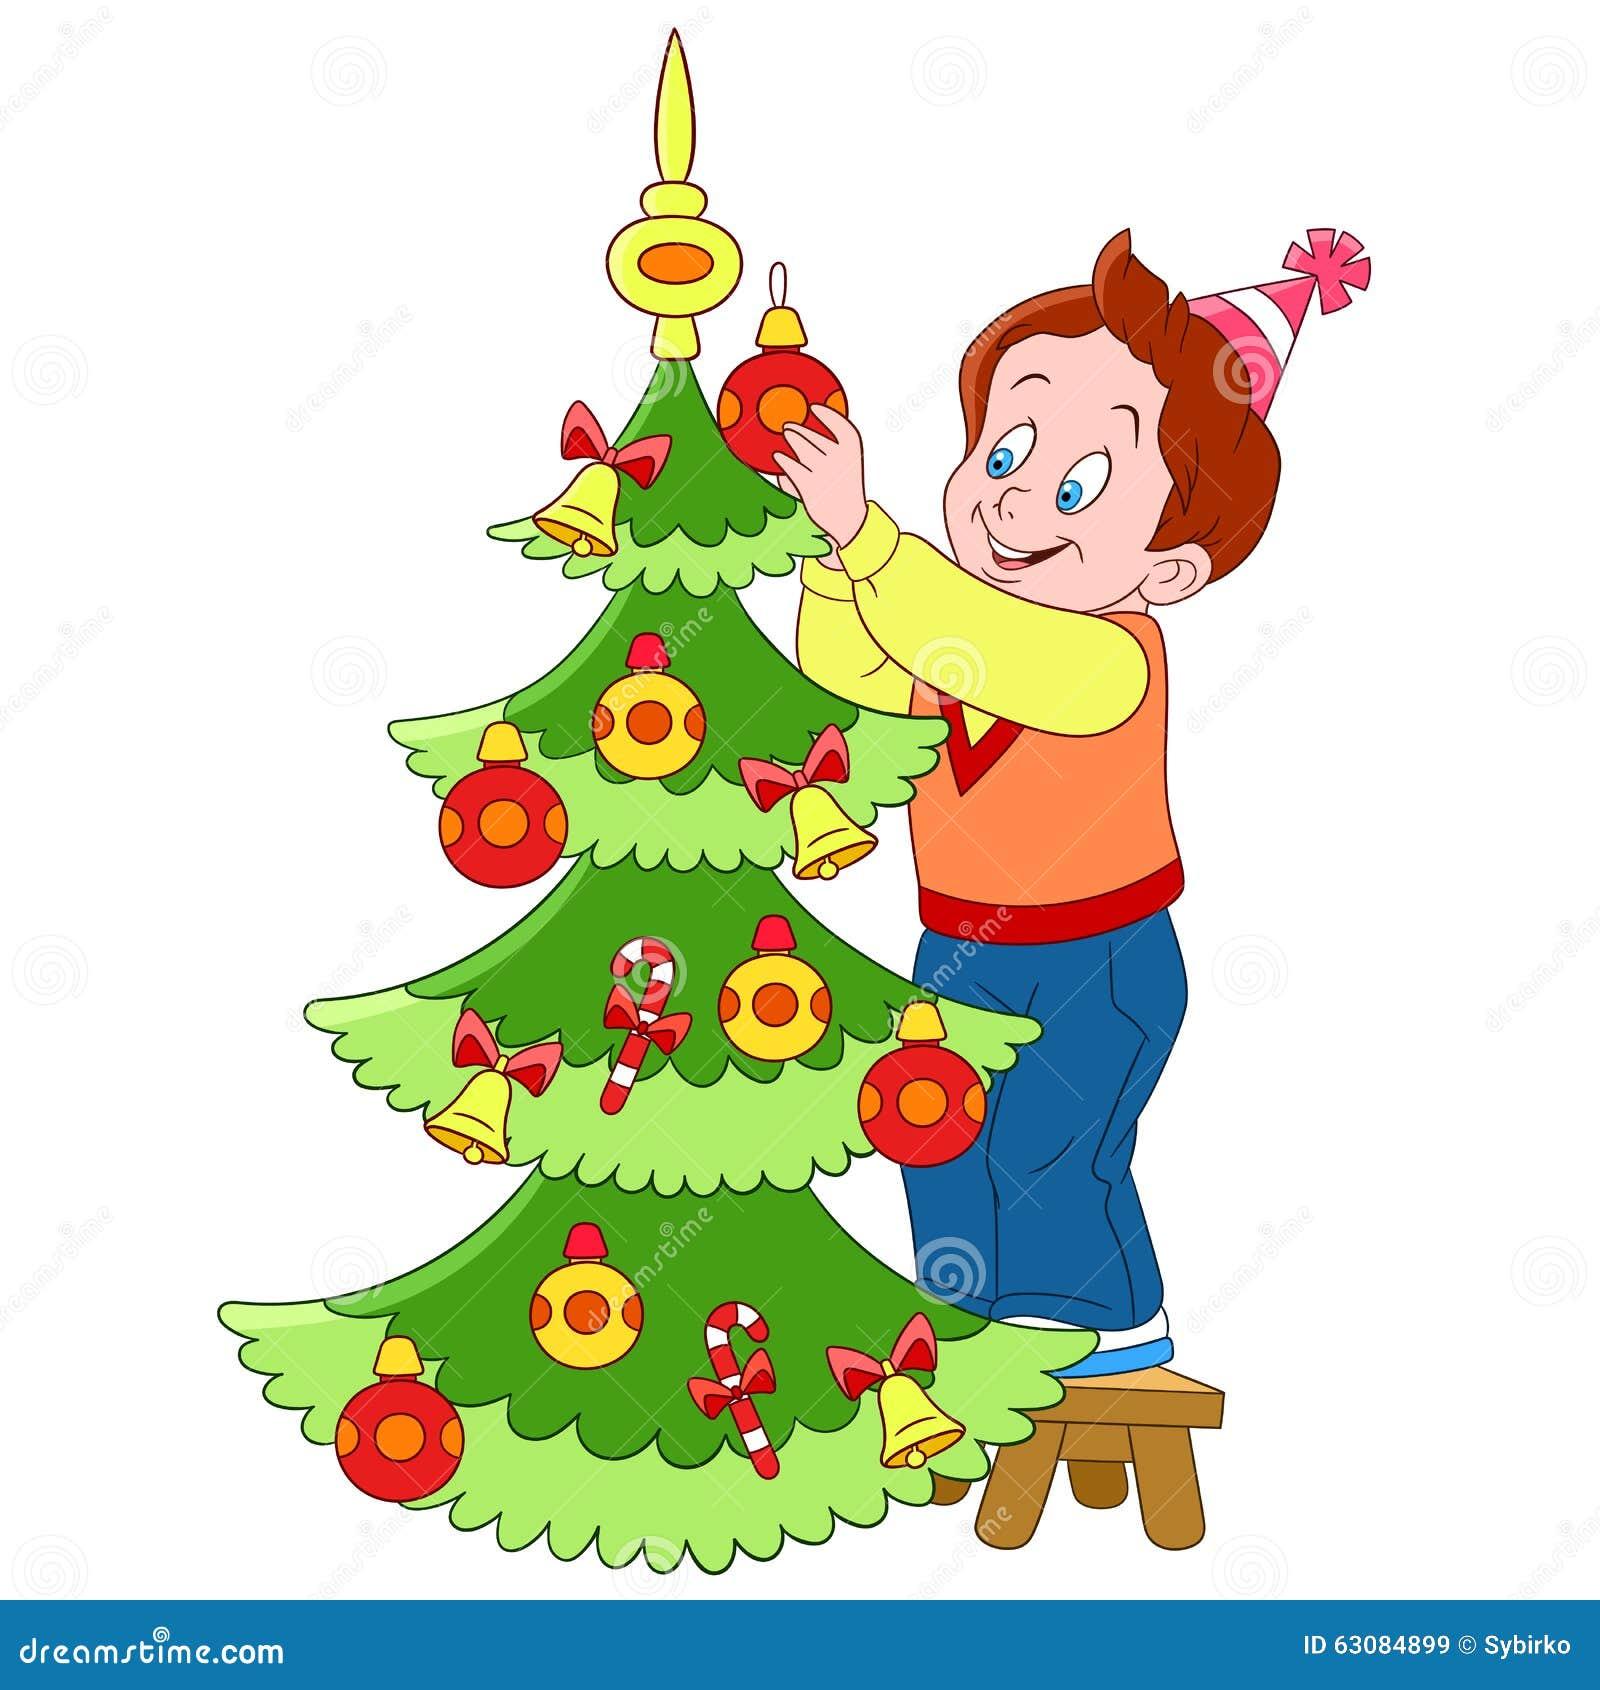 Cute Cartoon Boy And Xmas Tree Stock Vector - Illustration of ...